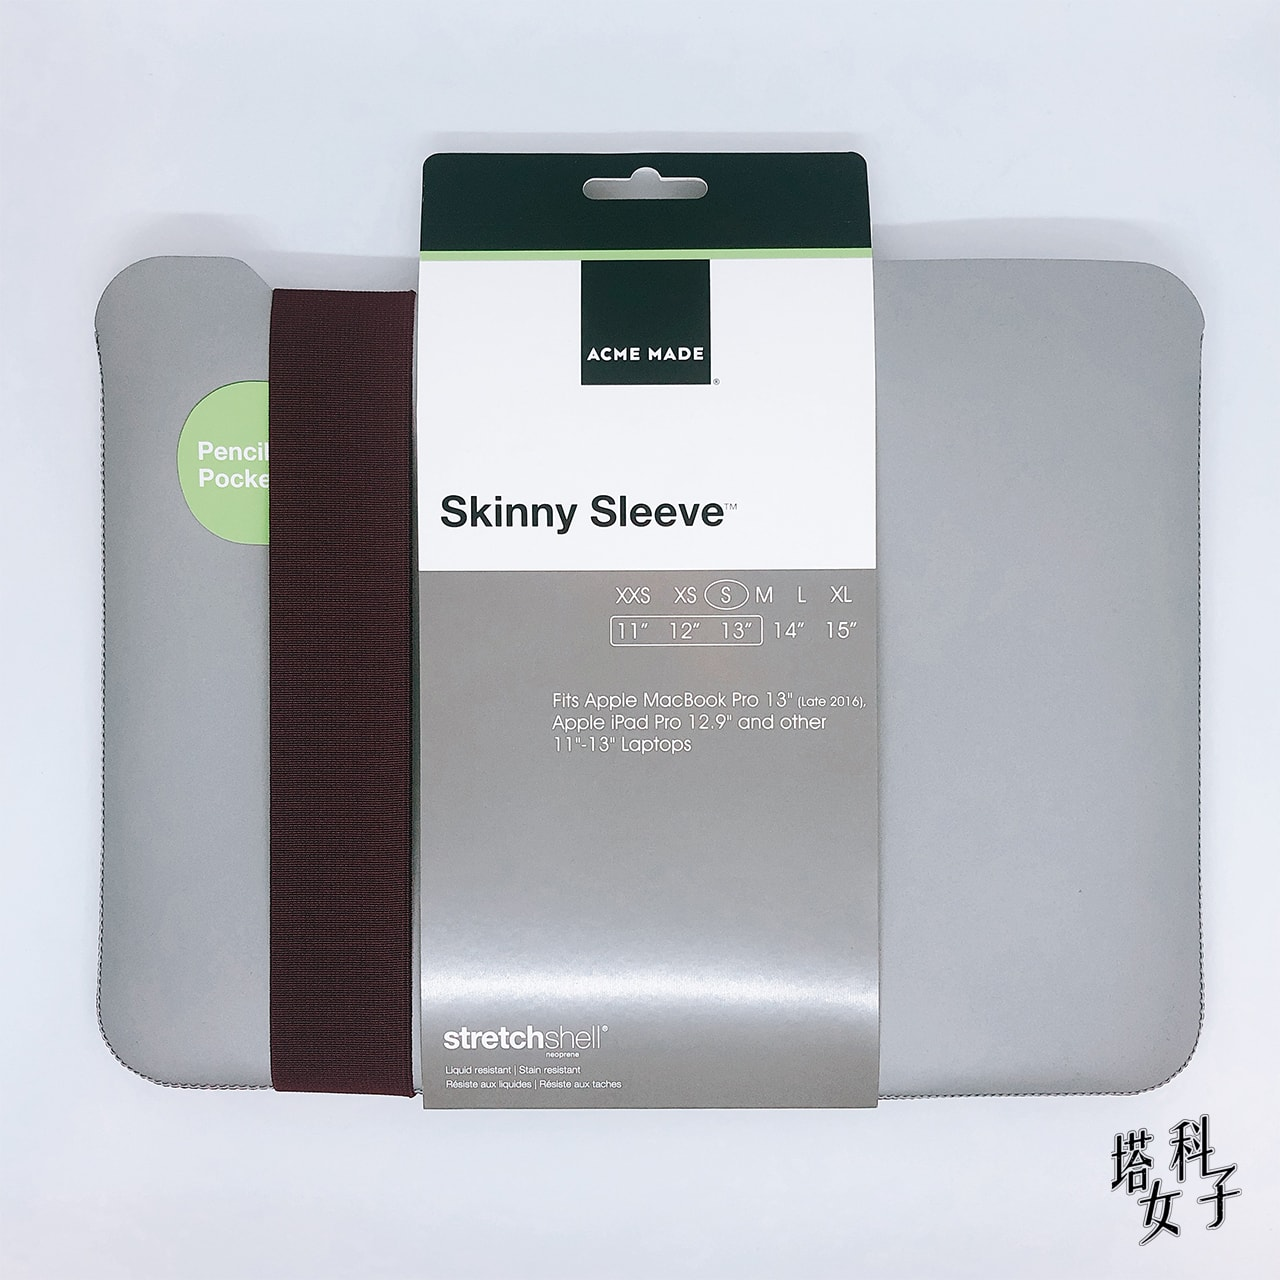 MacBook Pro/Air 保護套推薦 - Acme Made - Skinny Sleeve 外包裝